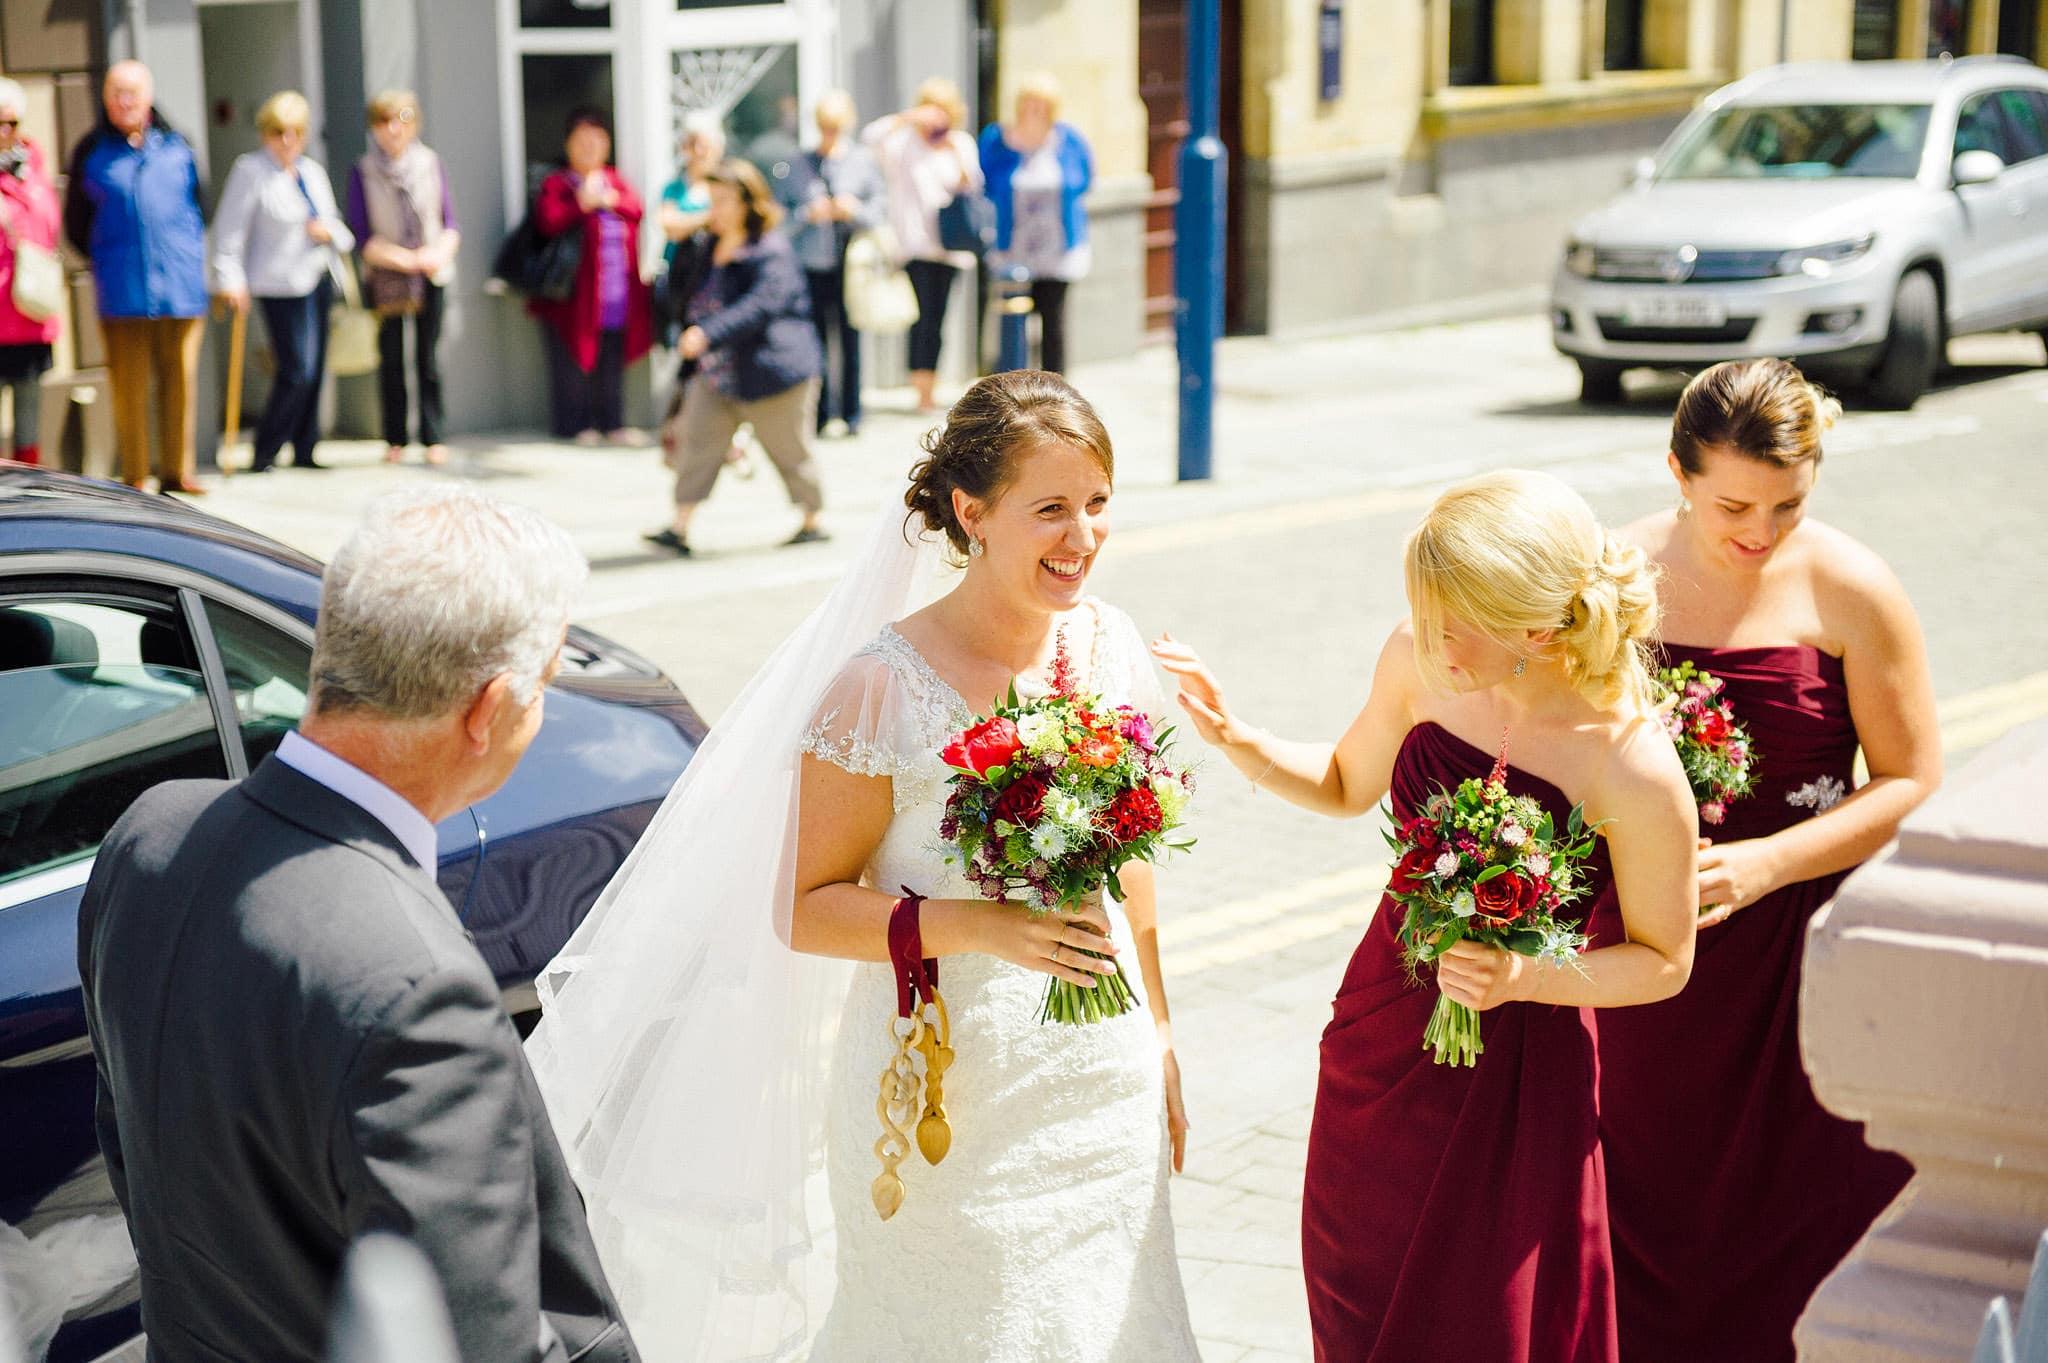 wedding-photographer-aberystwyth-wales (35)